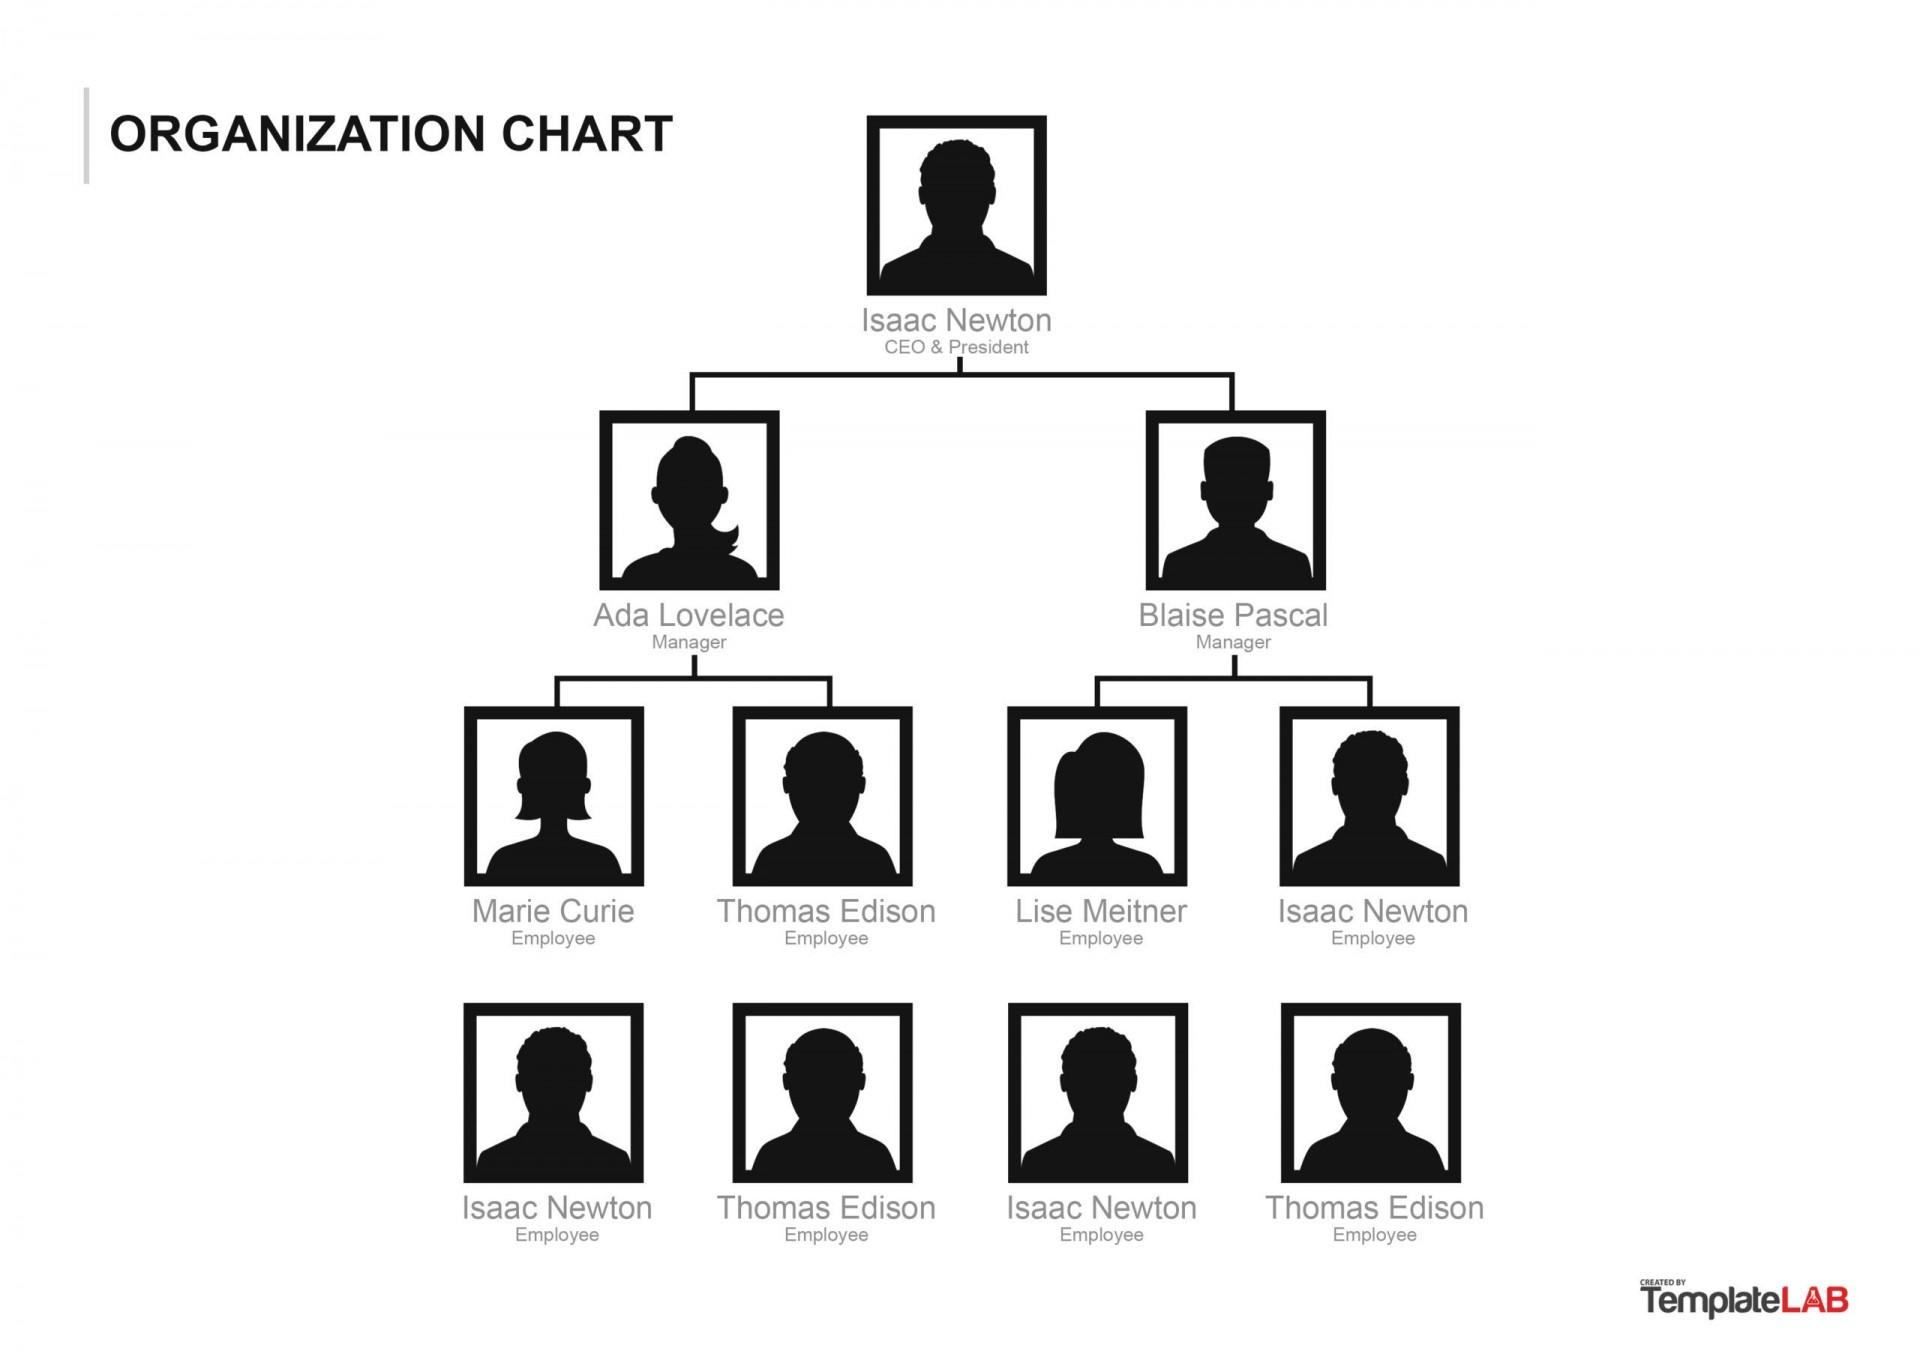 010 Best Microsoft Organizational Chart Template Word Inspiration  Free 2013 Hierarchy1920